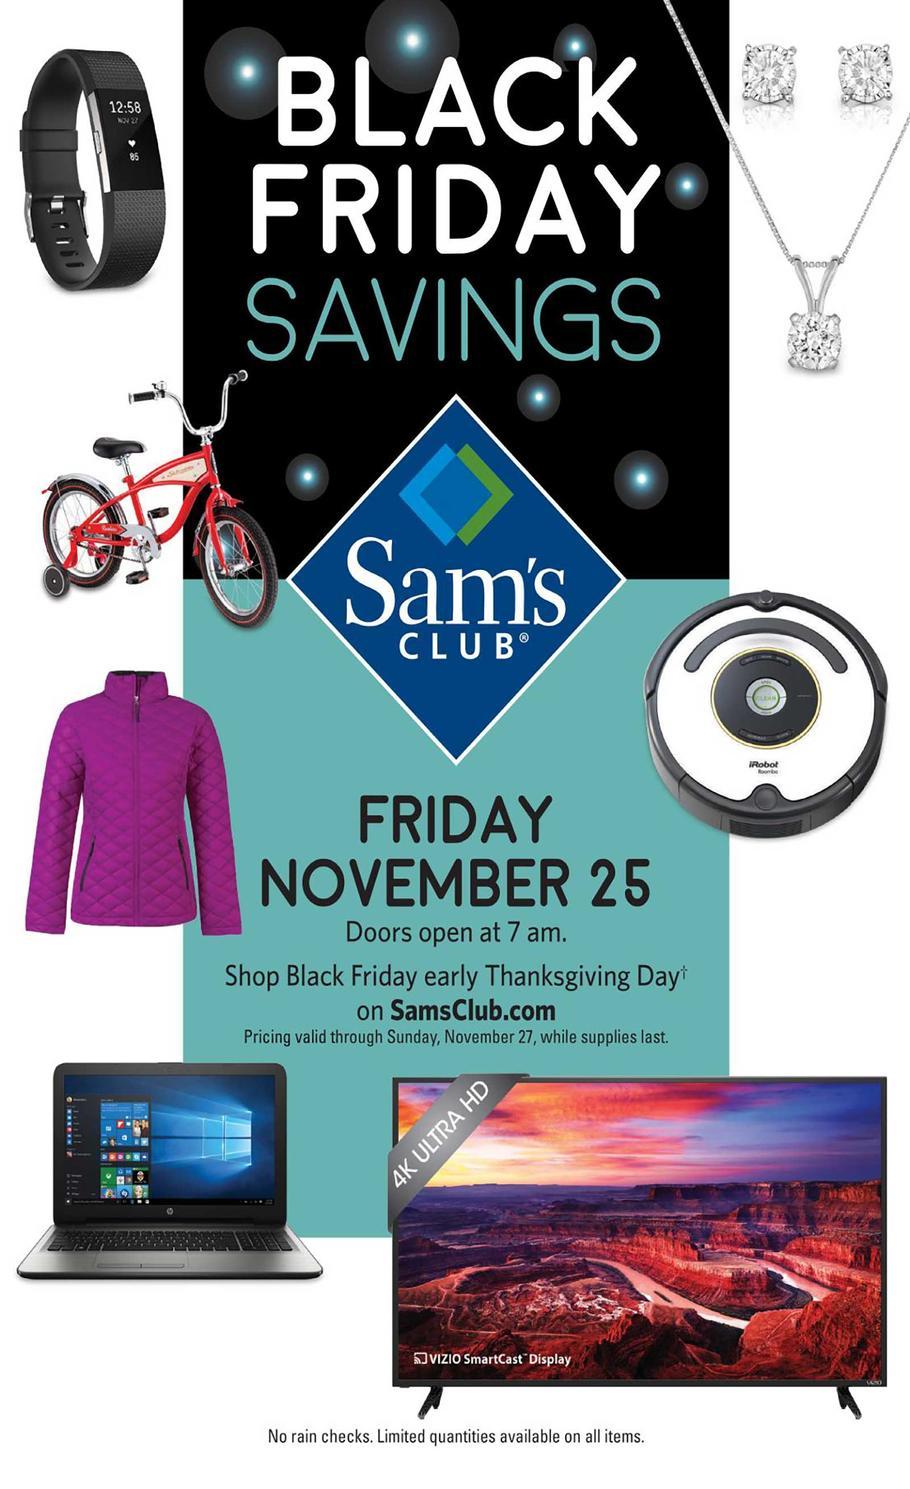 sams-club-black-friday-2016-full-ad-leaked-1